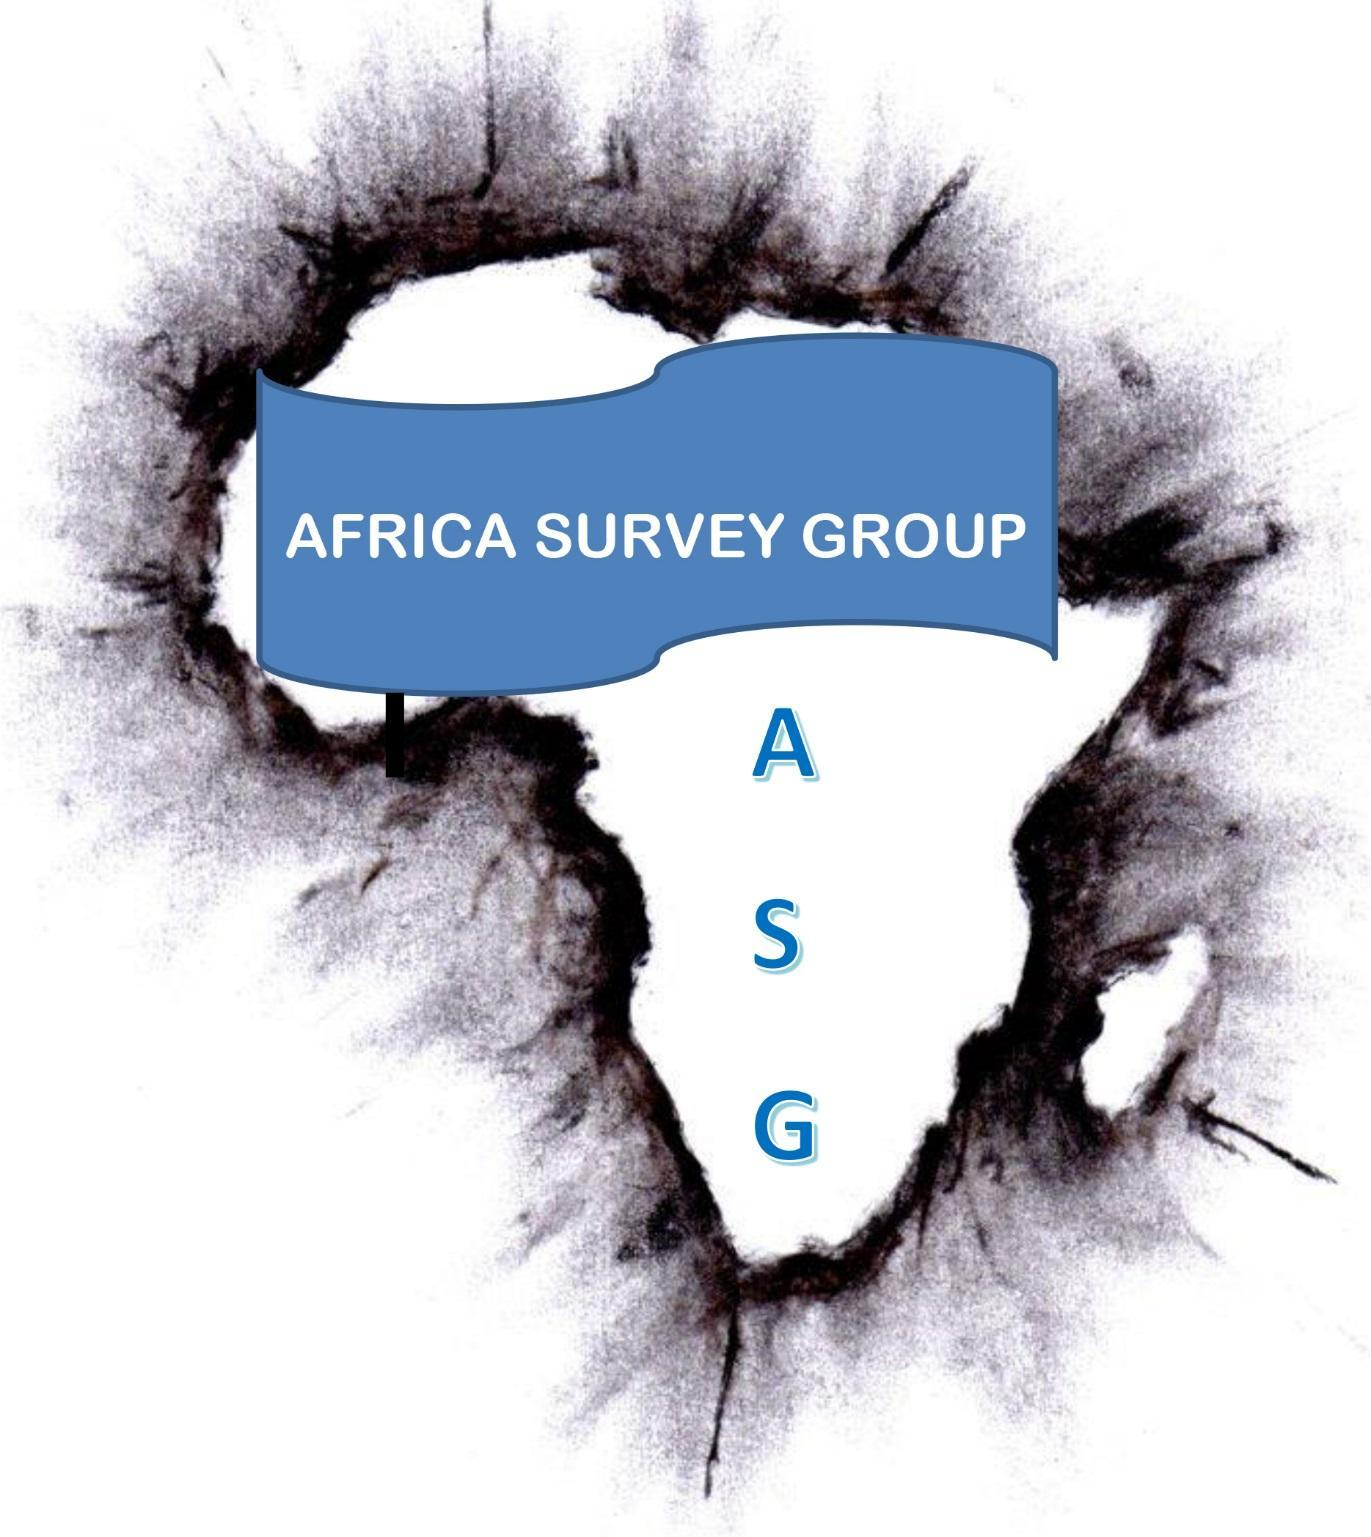 Africa Survey Group